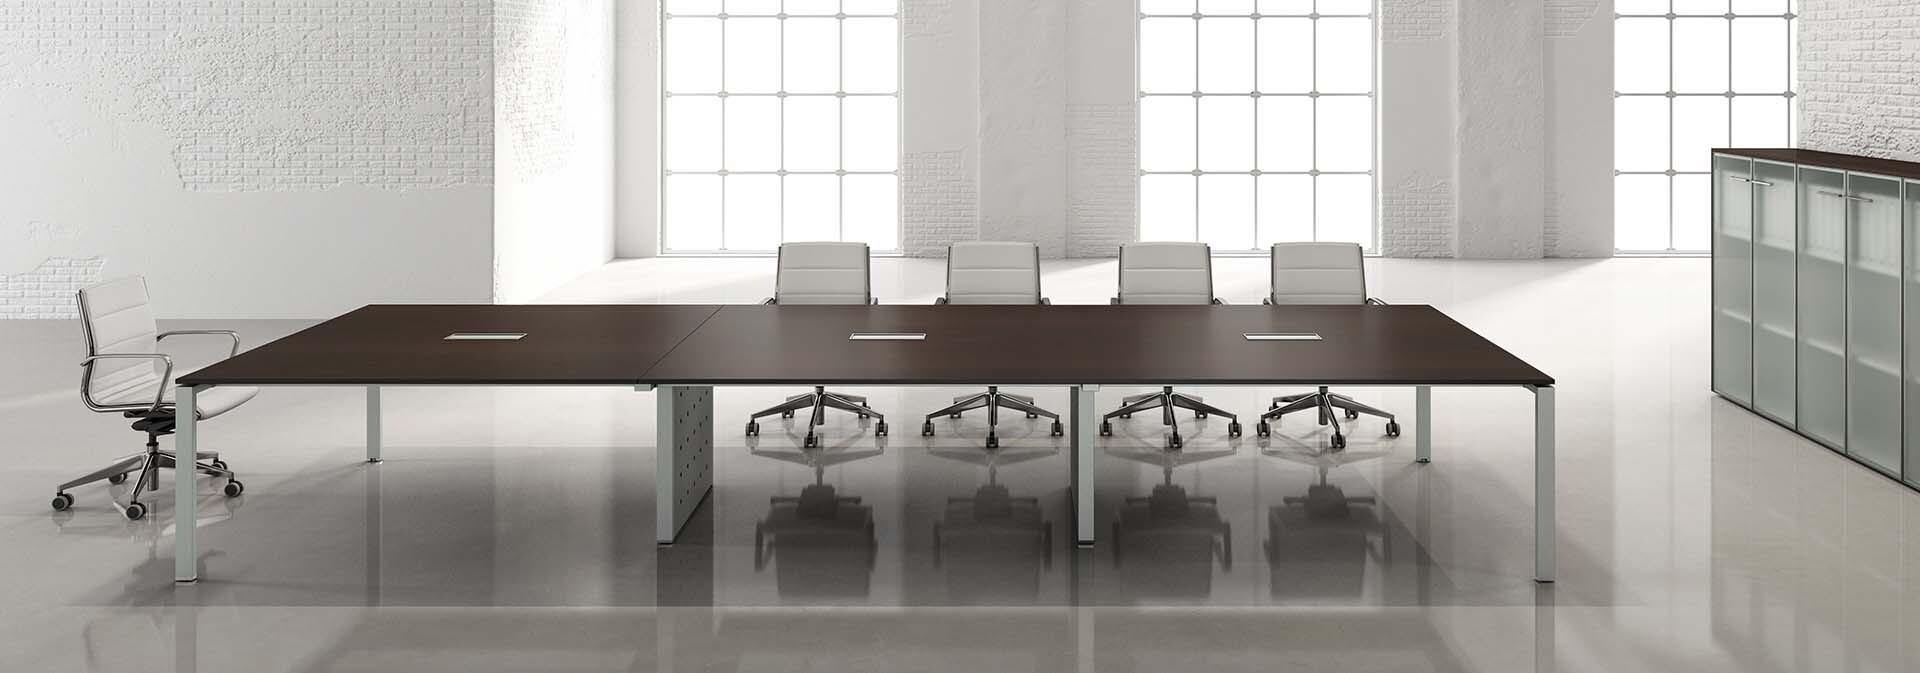 tavolo-conferenza-sedicinoni.jpg